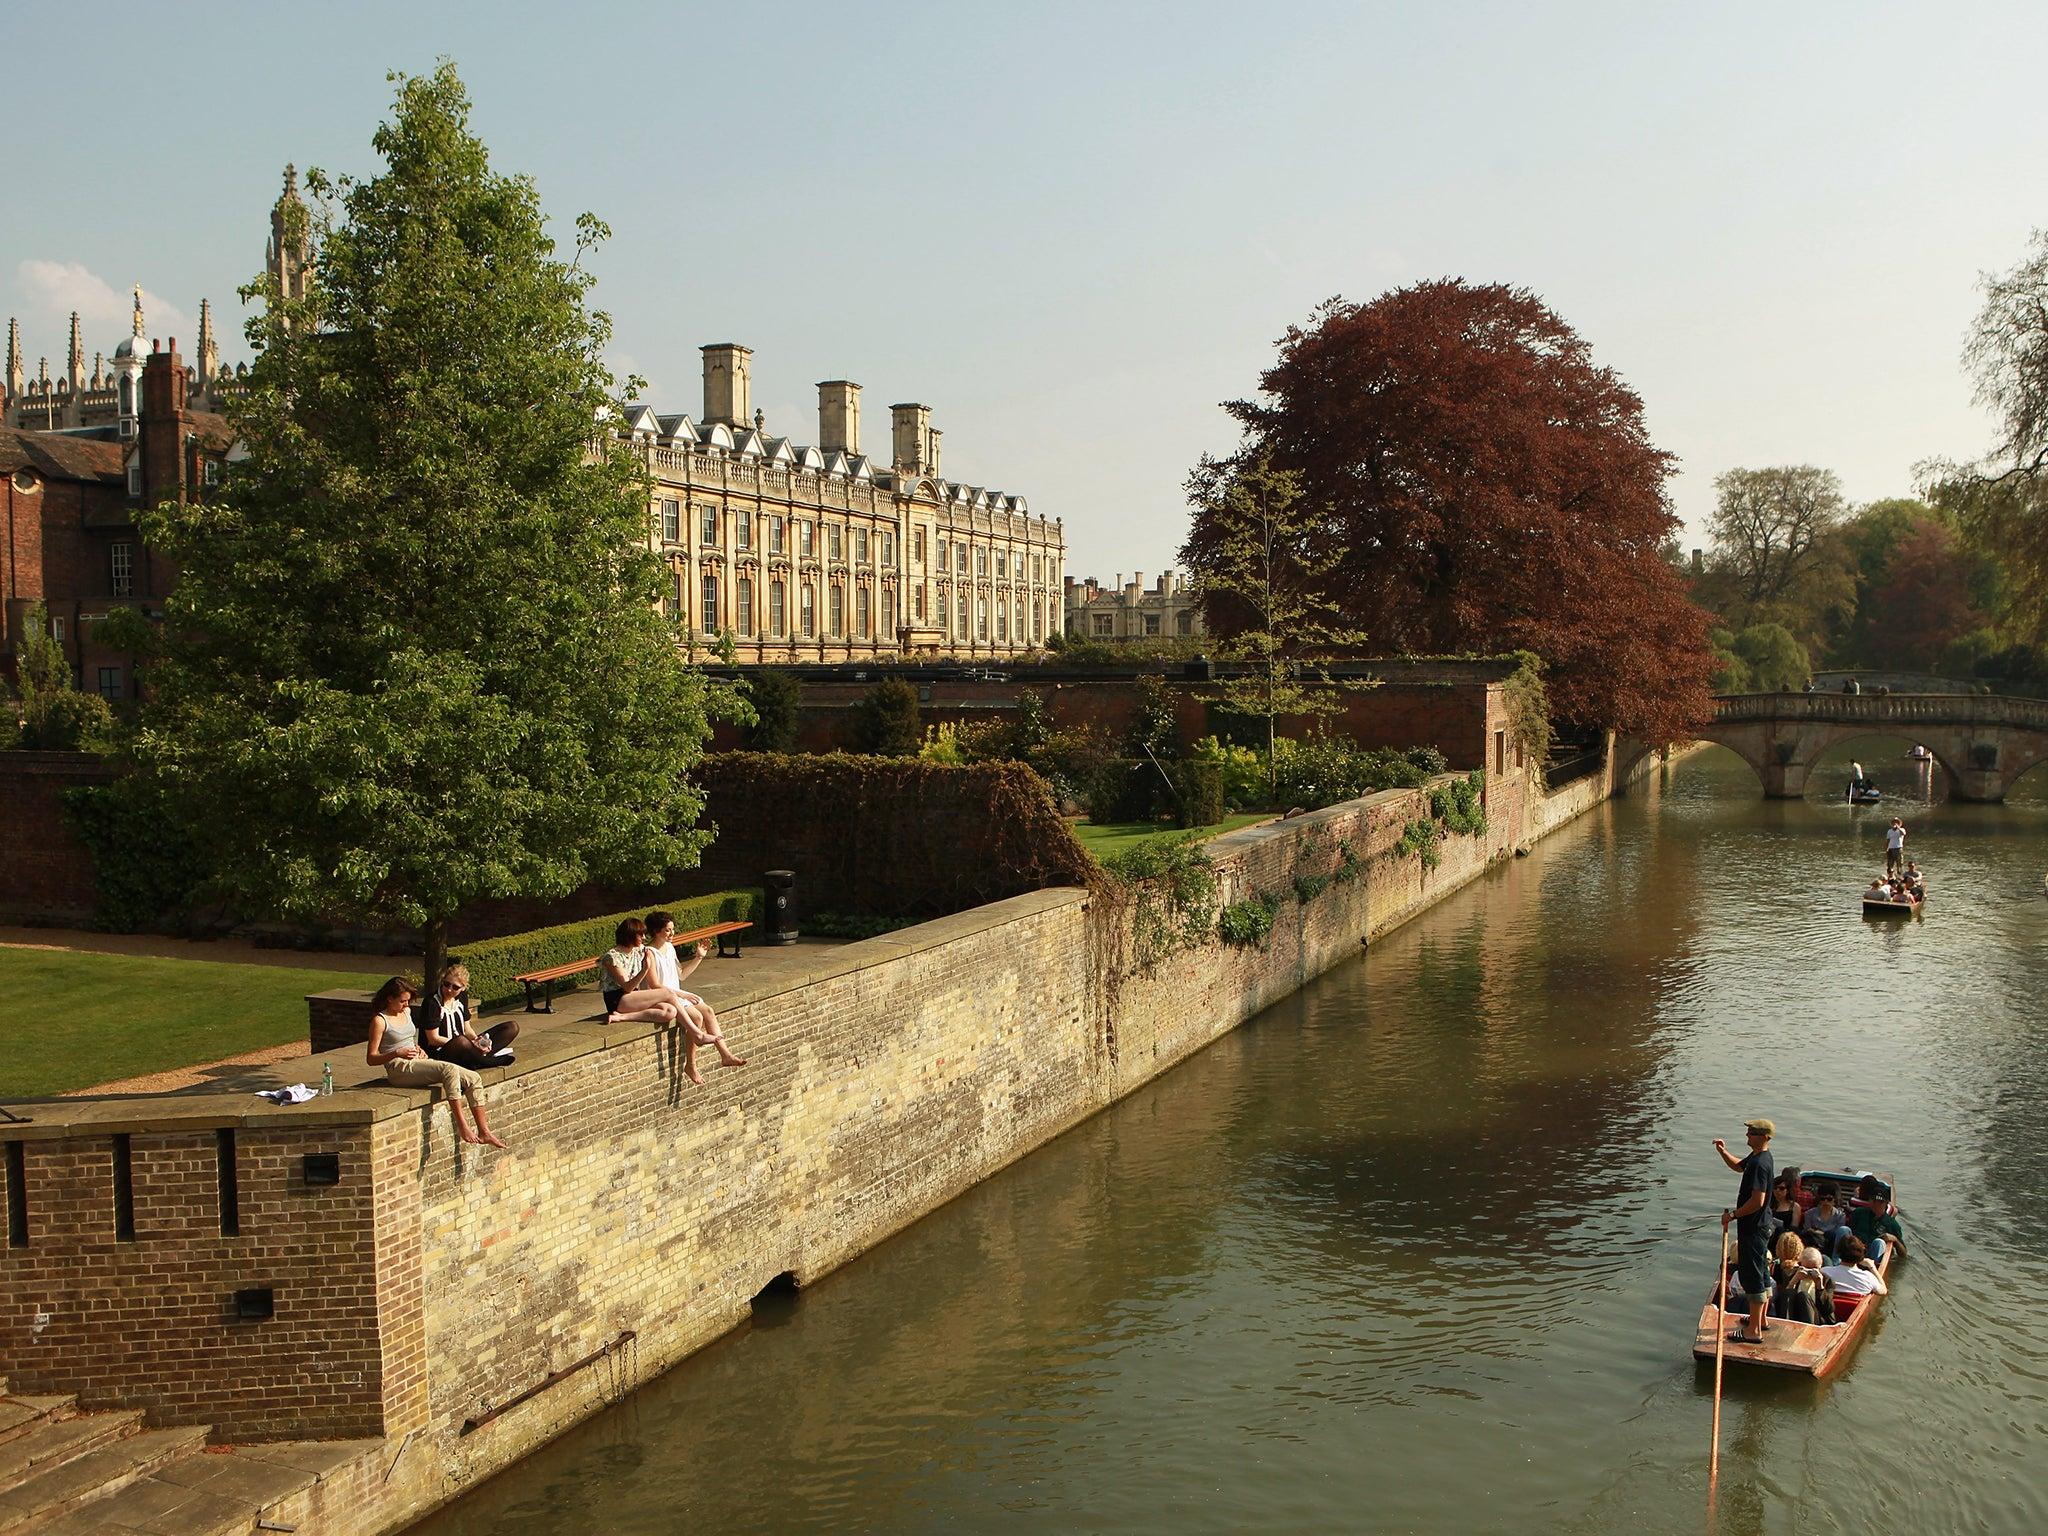 Should I go to Oxford or Cambridge?